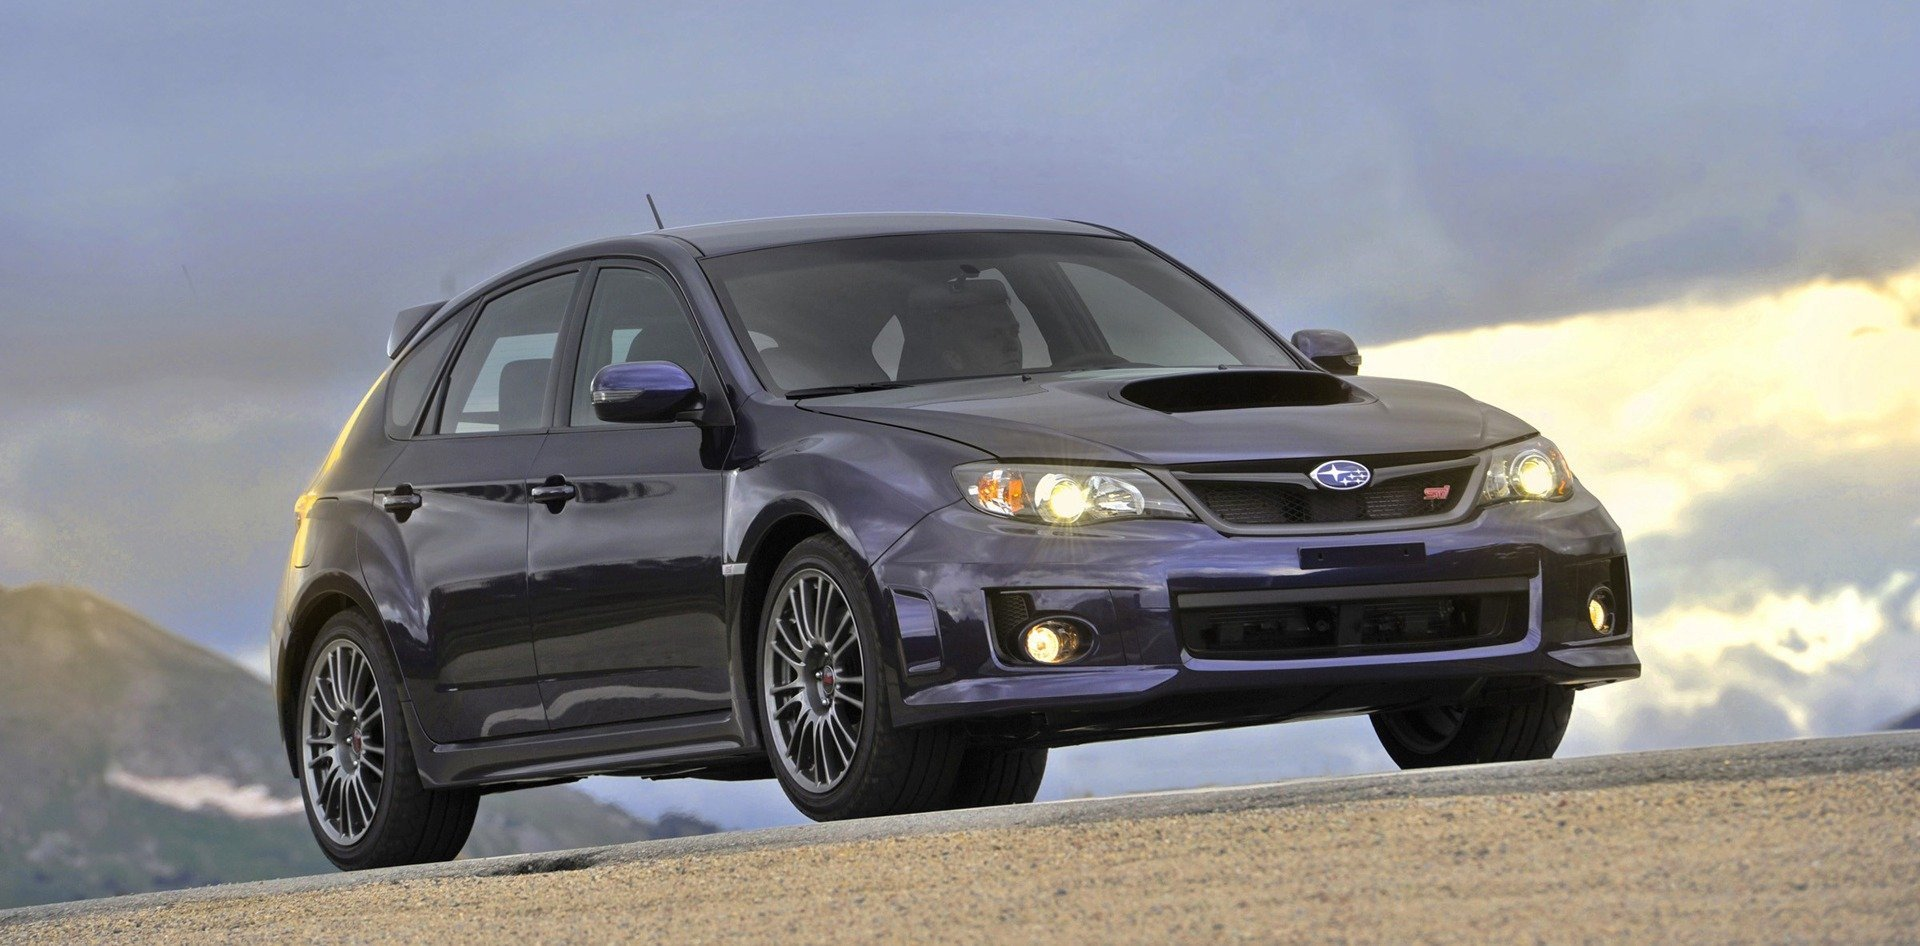 2012 Impreza WRX STI hatchback